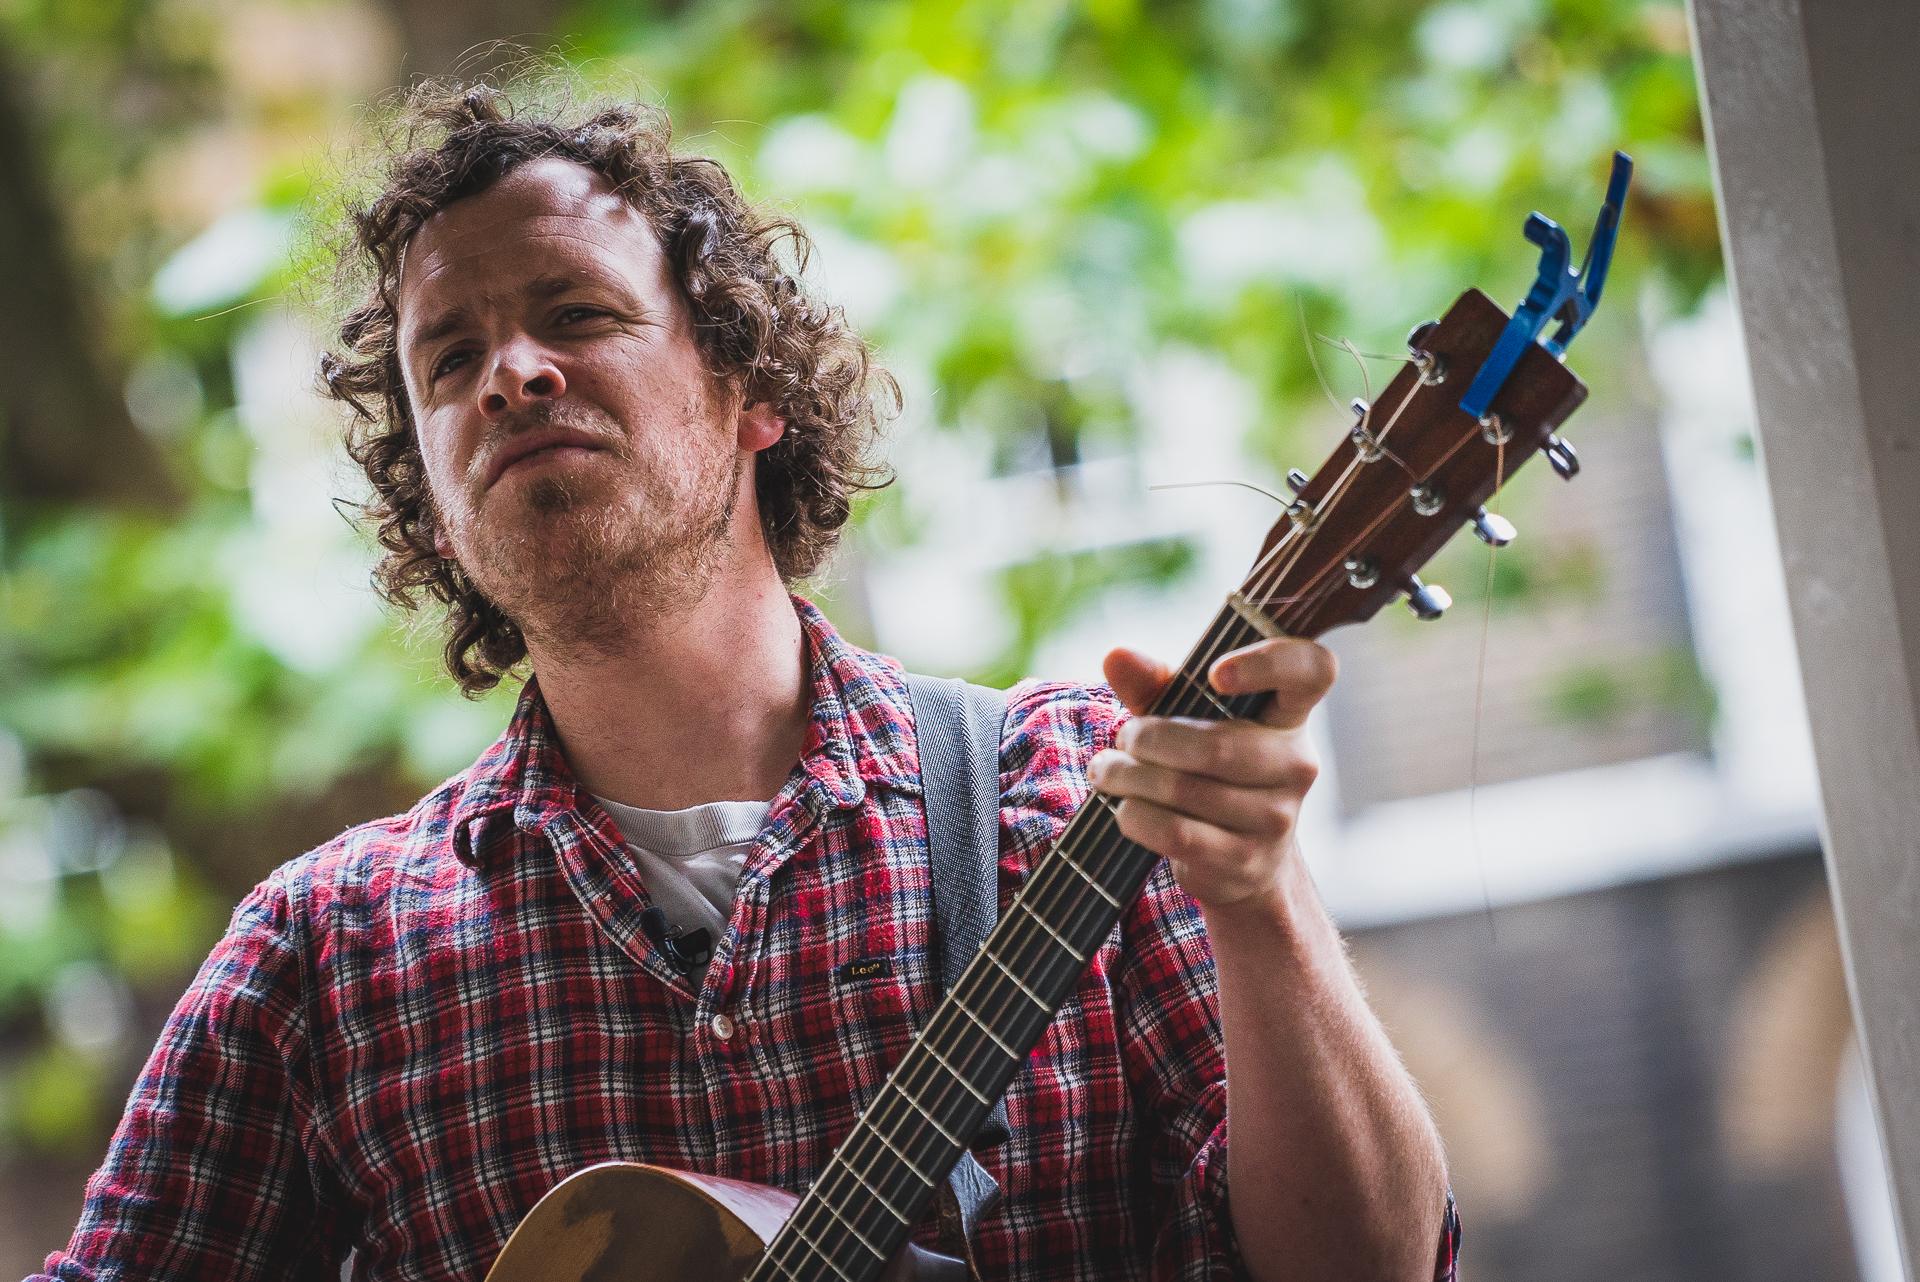 Bandstand Busking: Seamus Fogarty